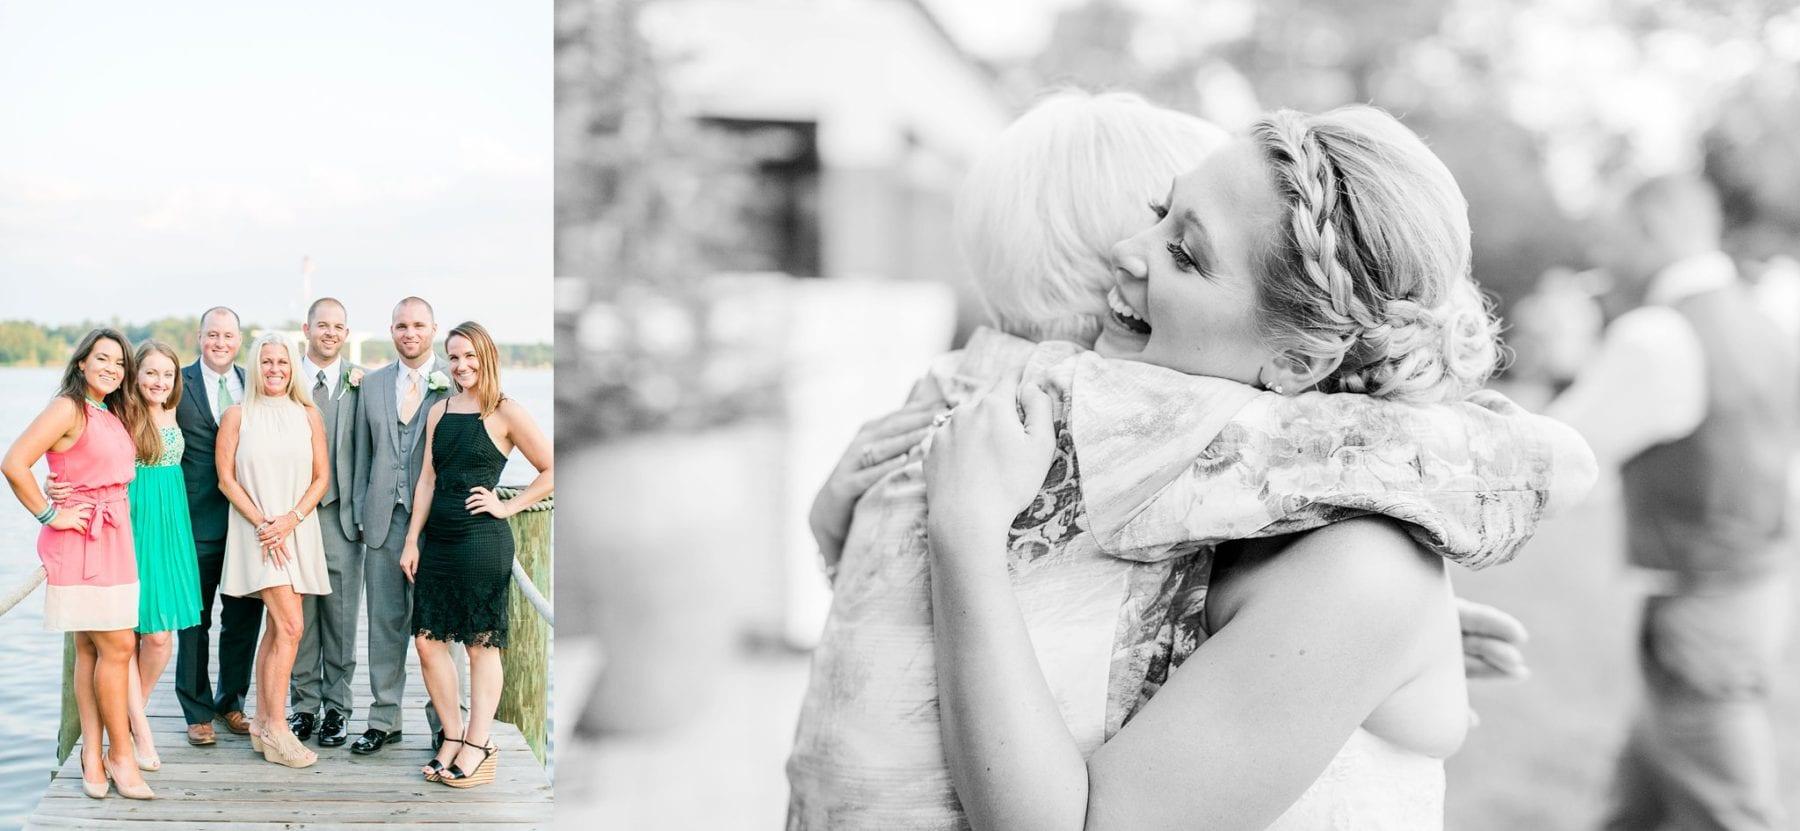 Waters Edge Wedding Photos Maryland Wedding Photographer Megan Kelsey Photography Katie & Conor-574.JPG